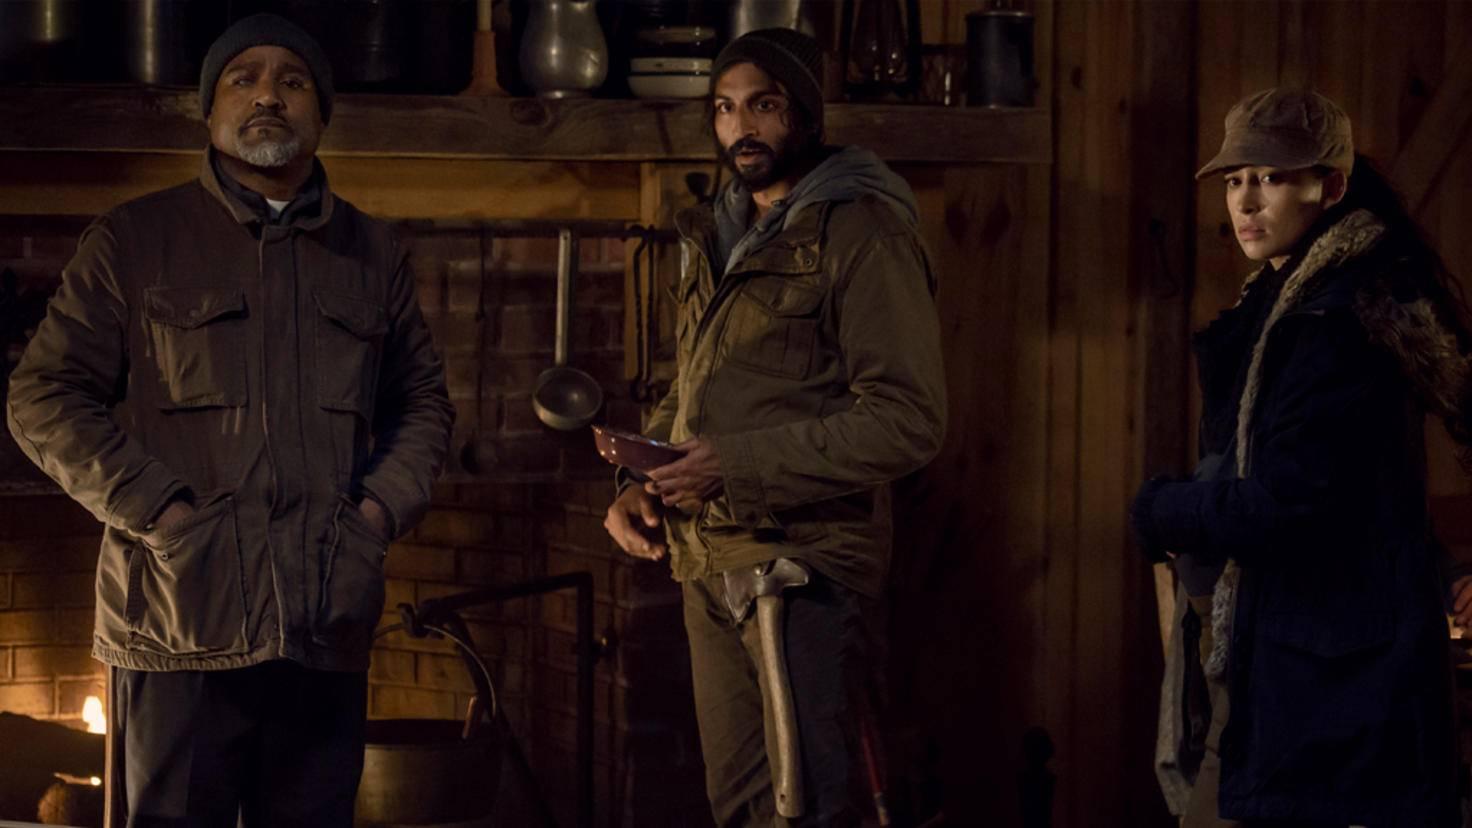 The Walking Dead-S09E16-Gabriel-Siddiq-Rosita-Gene Page-AMC